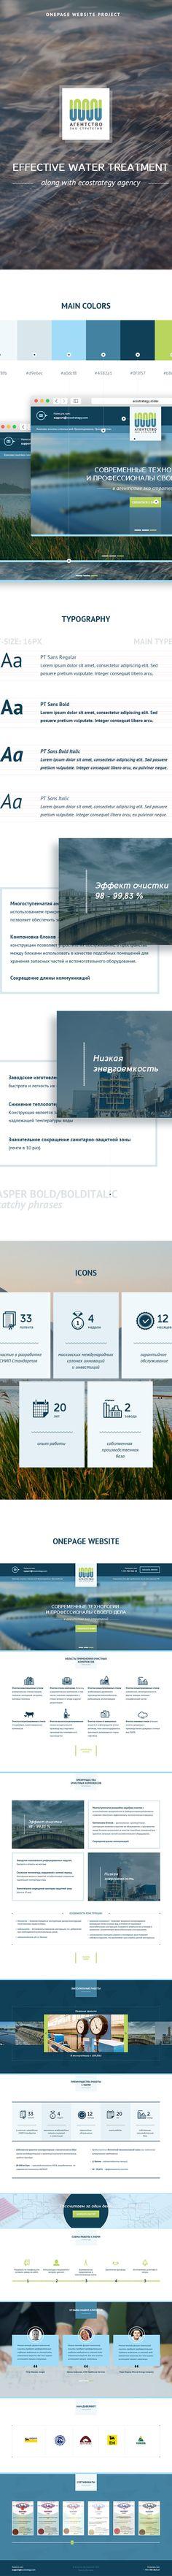 Ecostrategy Agency. Onepage Website by Olia Gozha, via Behance